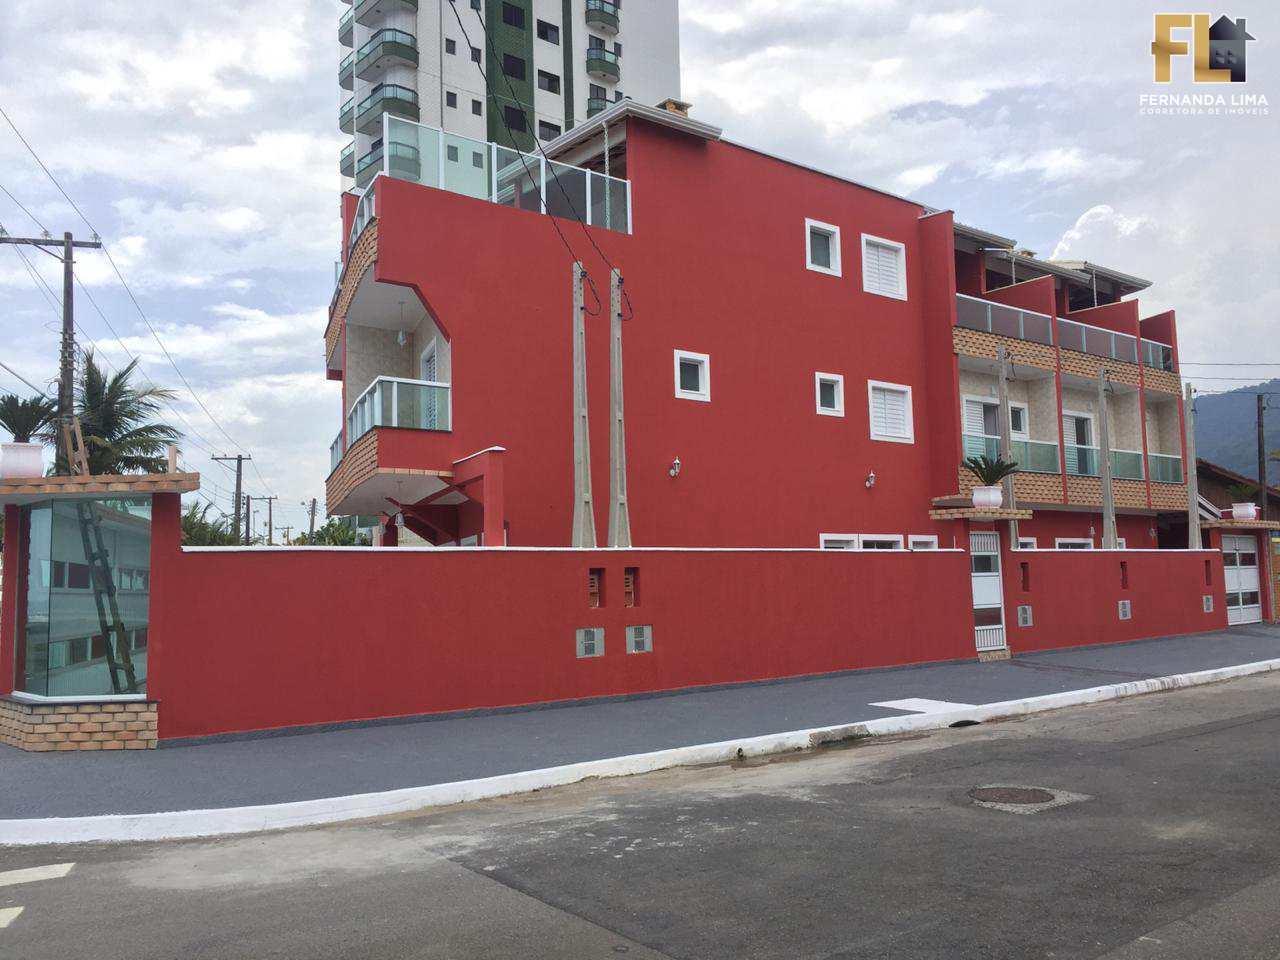 Casa de Condomínio com 3 dorms, Flórida, Praia Grande - R$ 299 mil, Cod: 45057